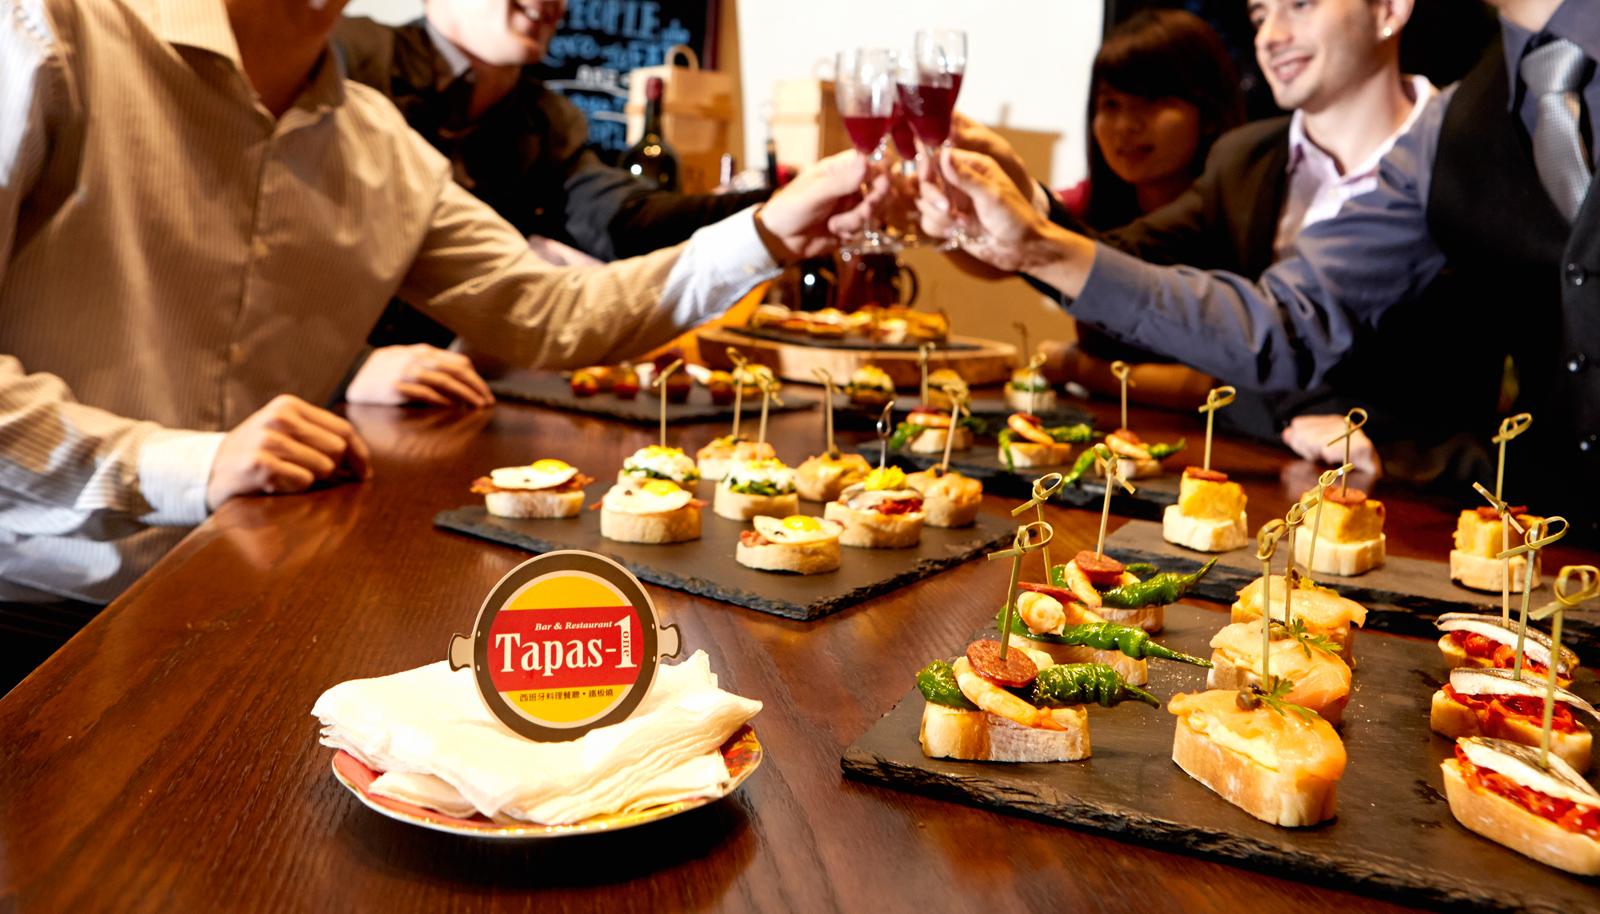 Dia mundial de la tapa 2016 16 de junio culinary for De tapa en tapa las palmas